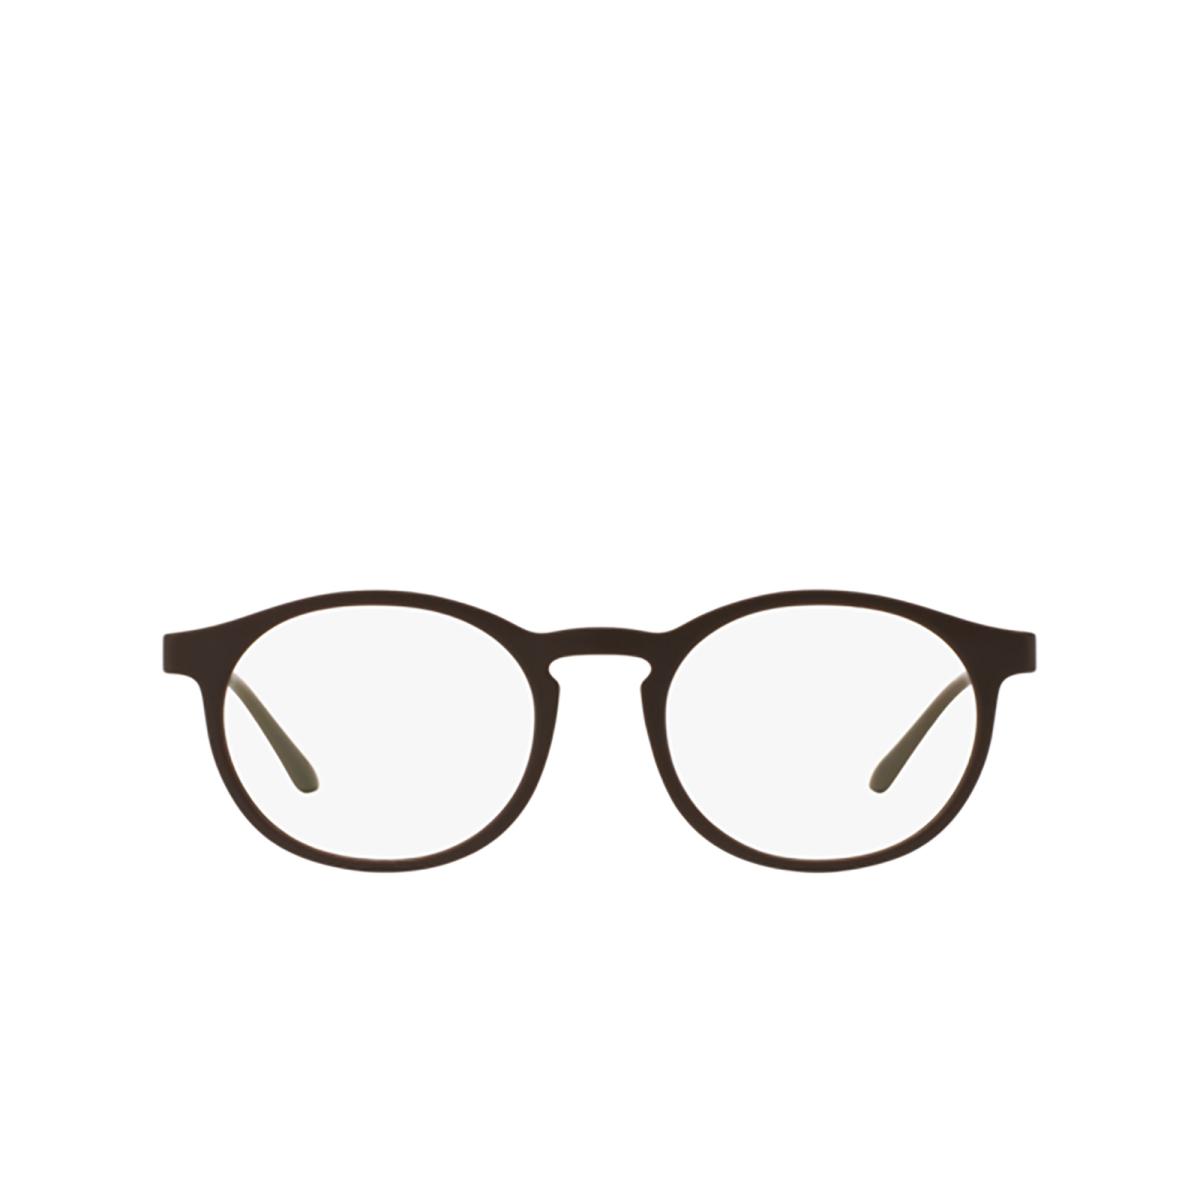 Giorgio Armani® Round Eyeglasses: AR7097 color 5491 - front view.